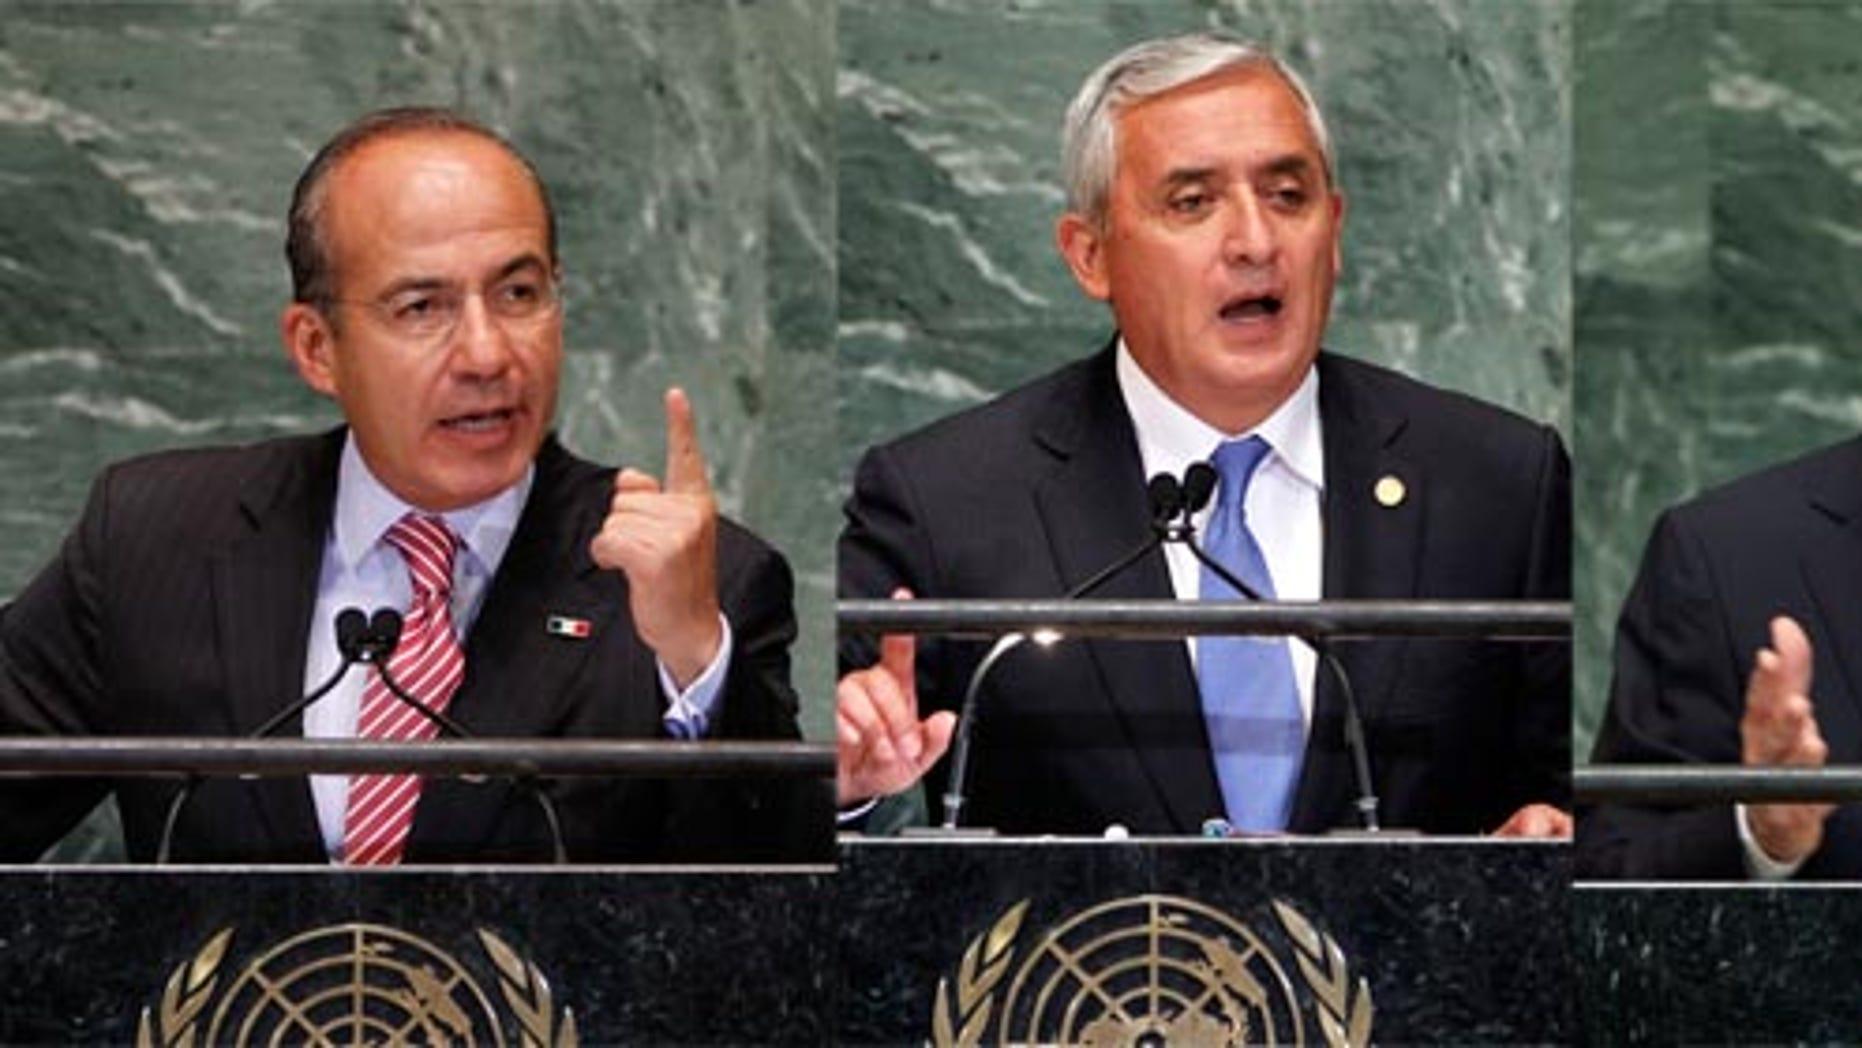 President Felipe Calderon of Mexico, President of Guatemala Otto Perez Molina, and the President of Colombia Juan Manuel Santos.